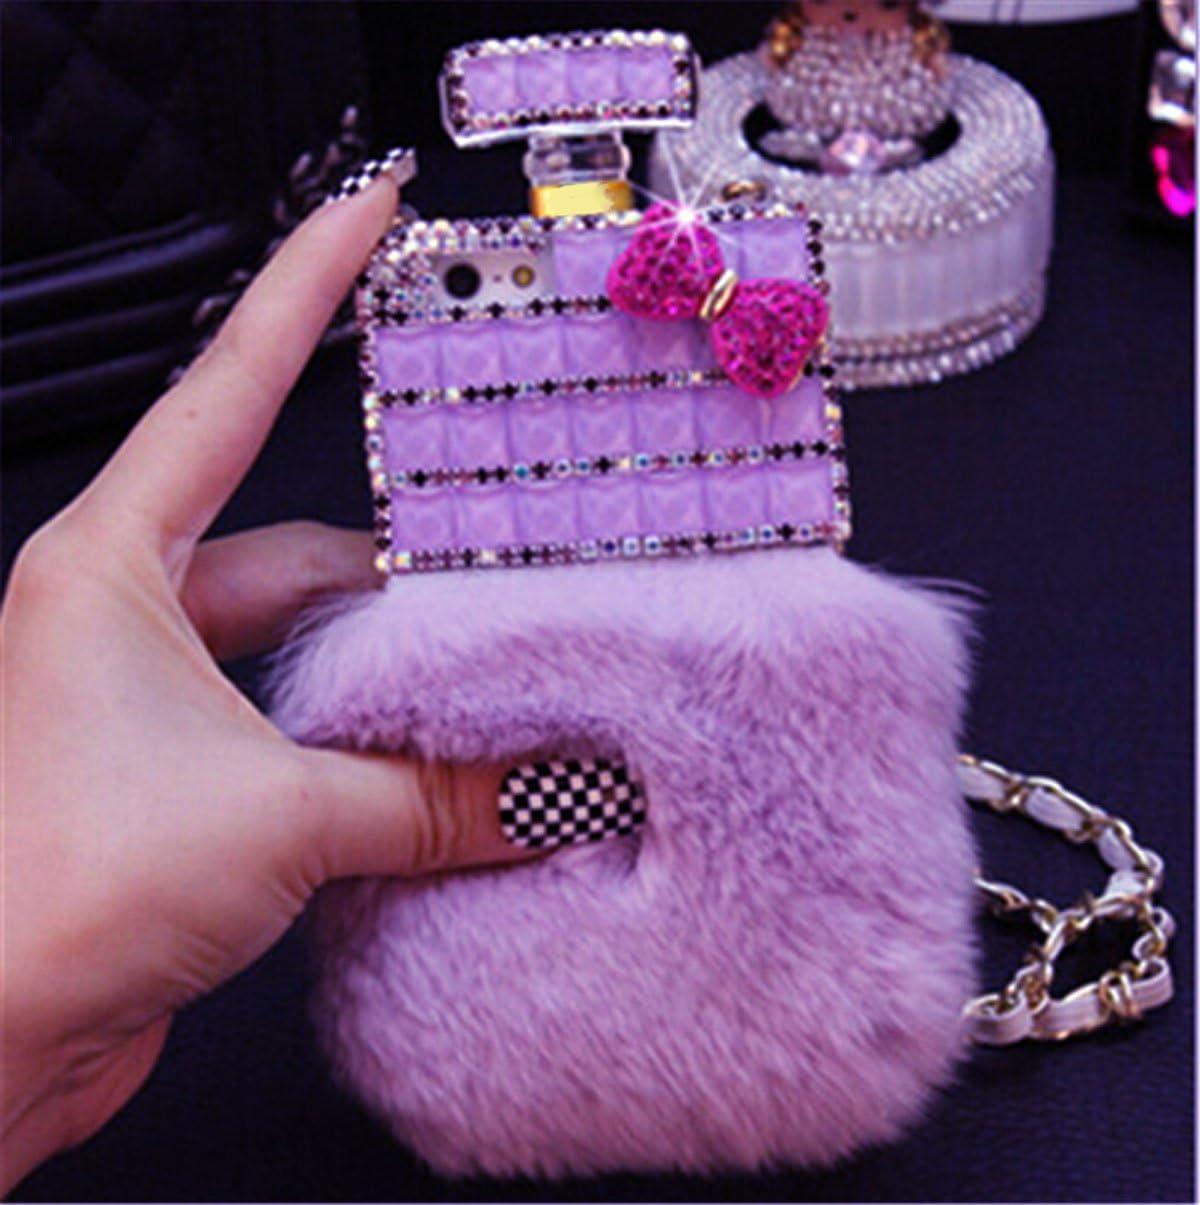 "Fusicase Luxury Perfume Bottle Design Bling Rex Rabbit Fur Bling Diamond Hair Sleeve Plush Back Case Cover for iPhone 6 Plus/6S Plus 5.5"" (Light Purple)"